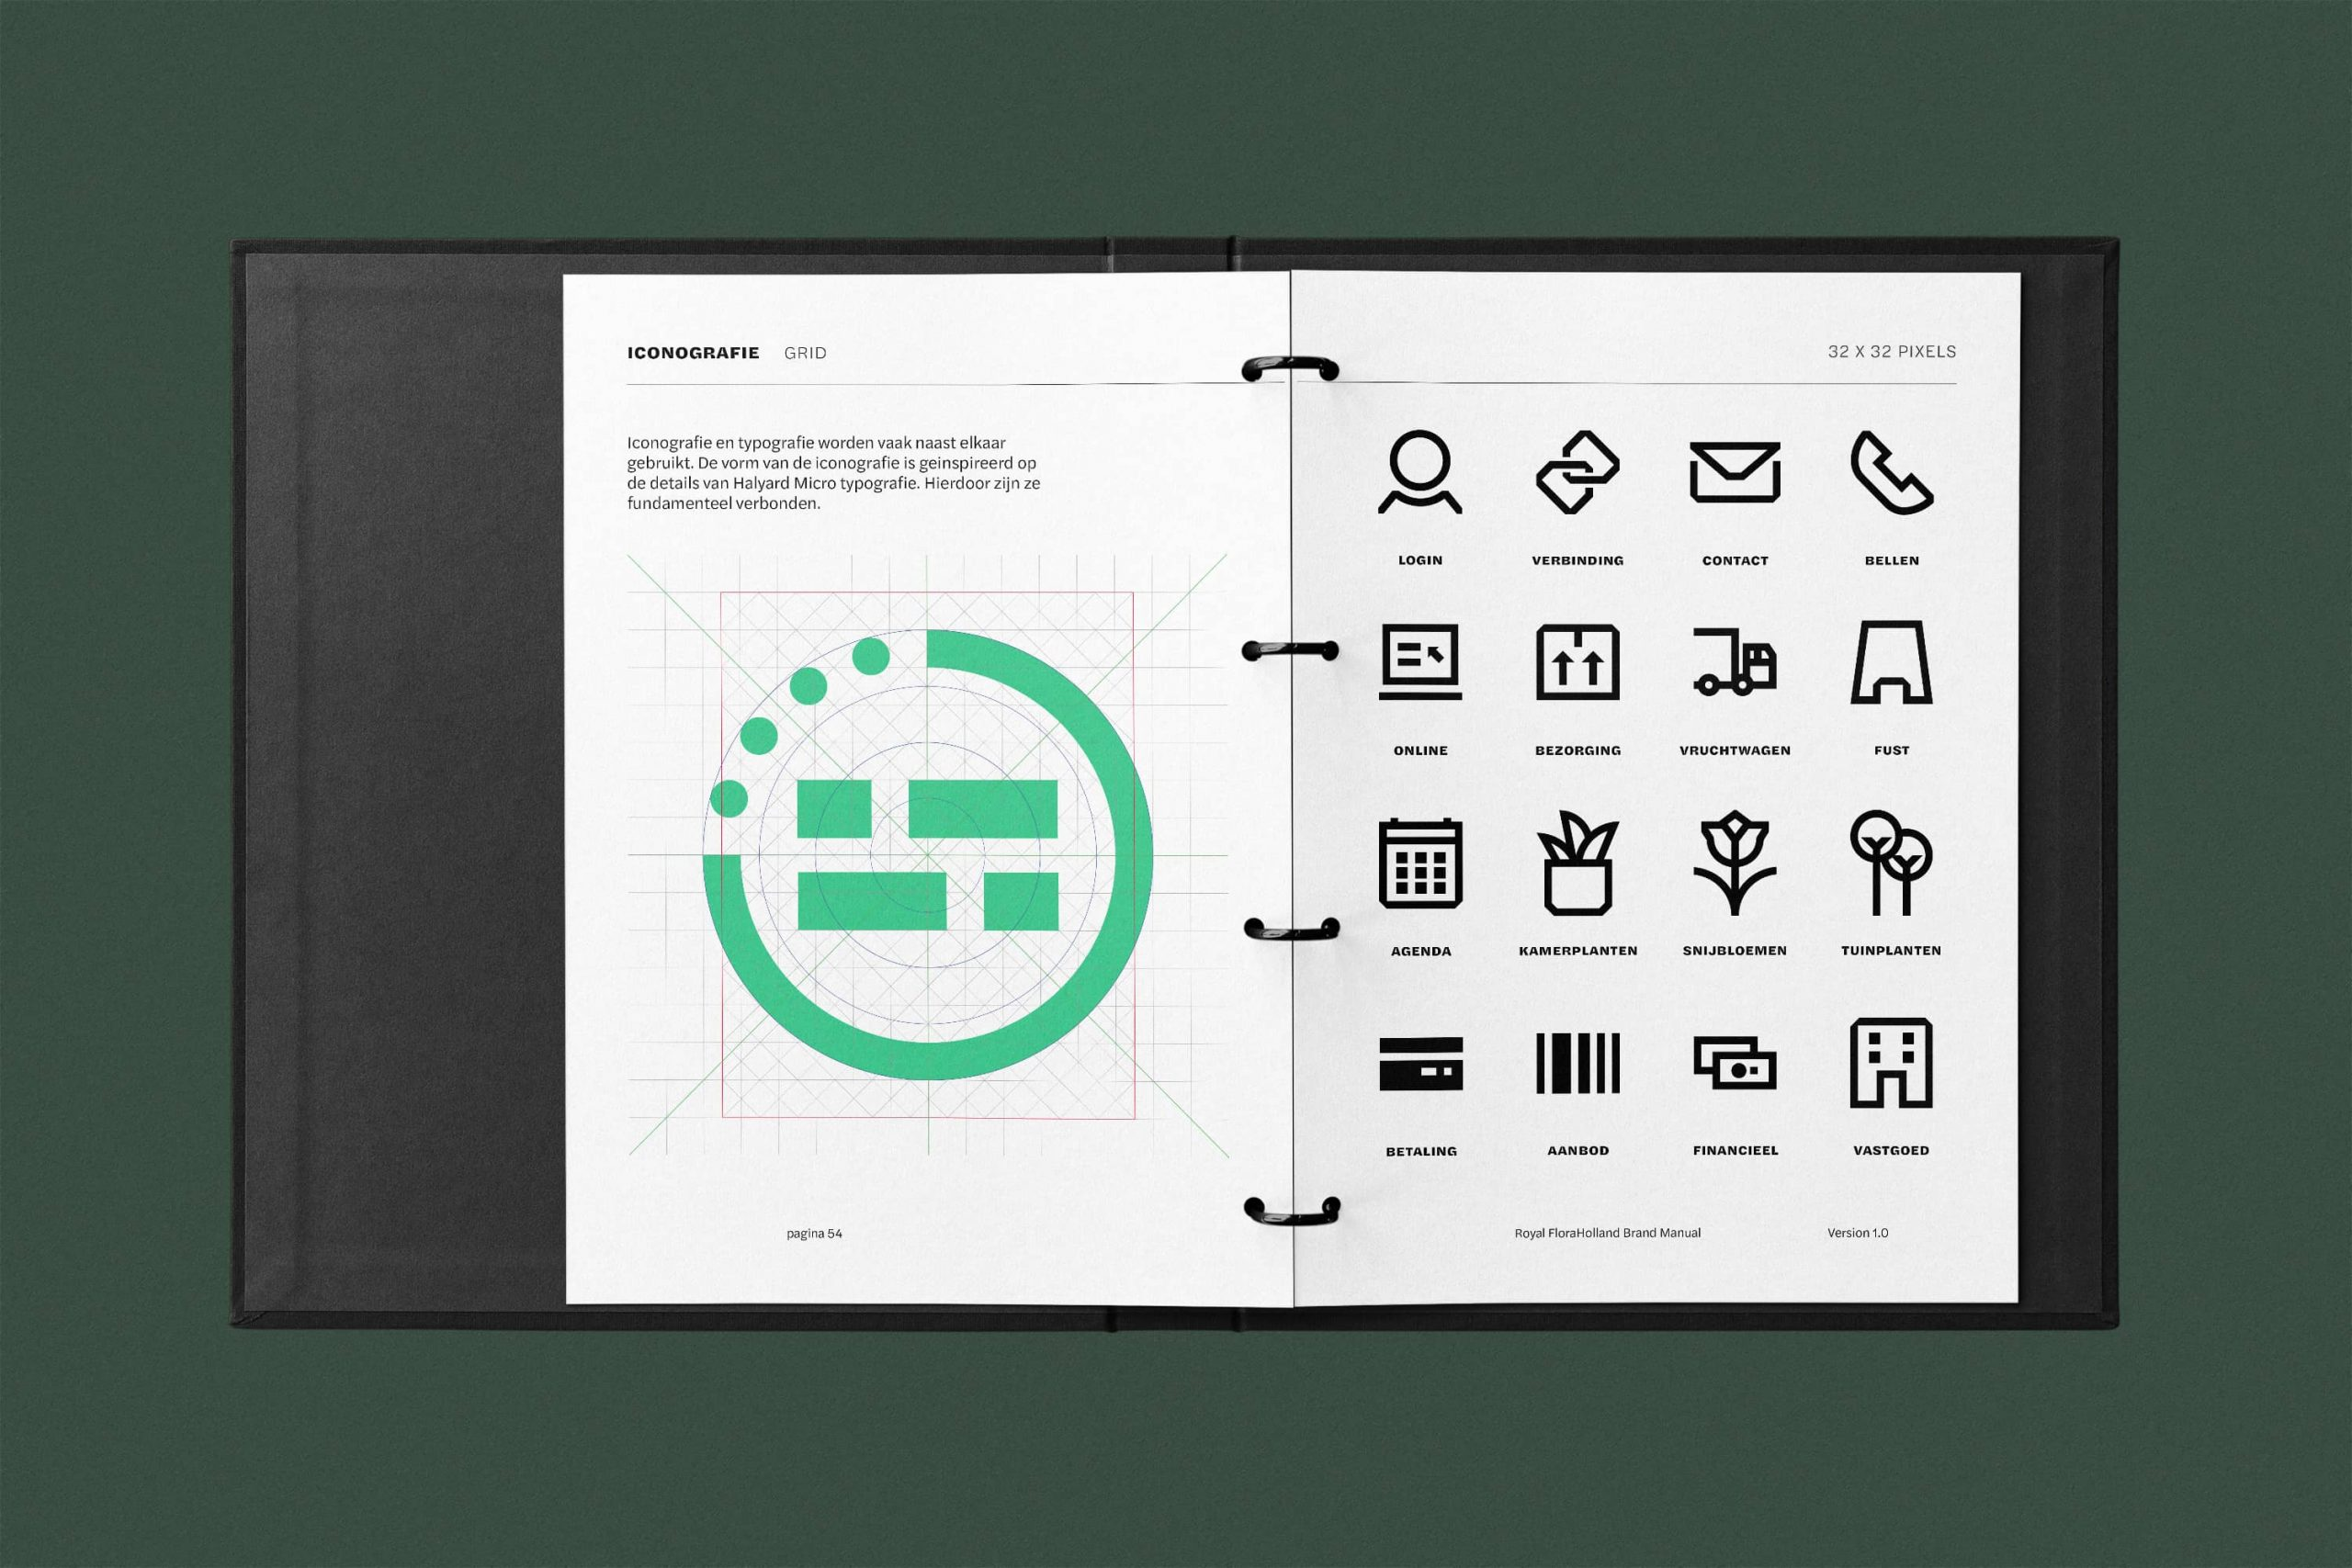 Dittmar_15_RFH_Iconography